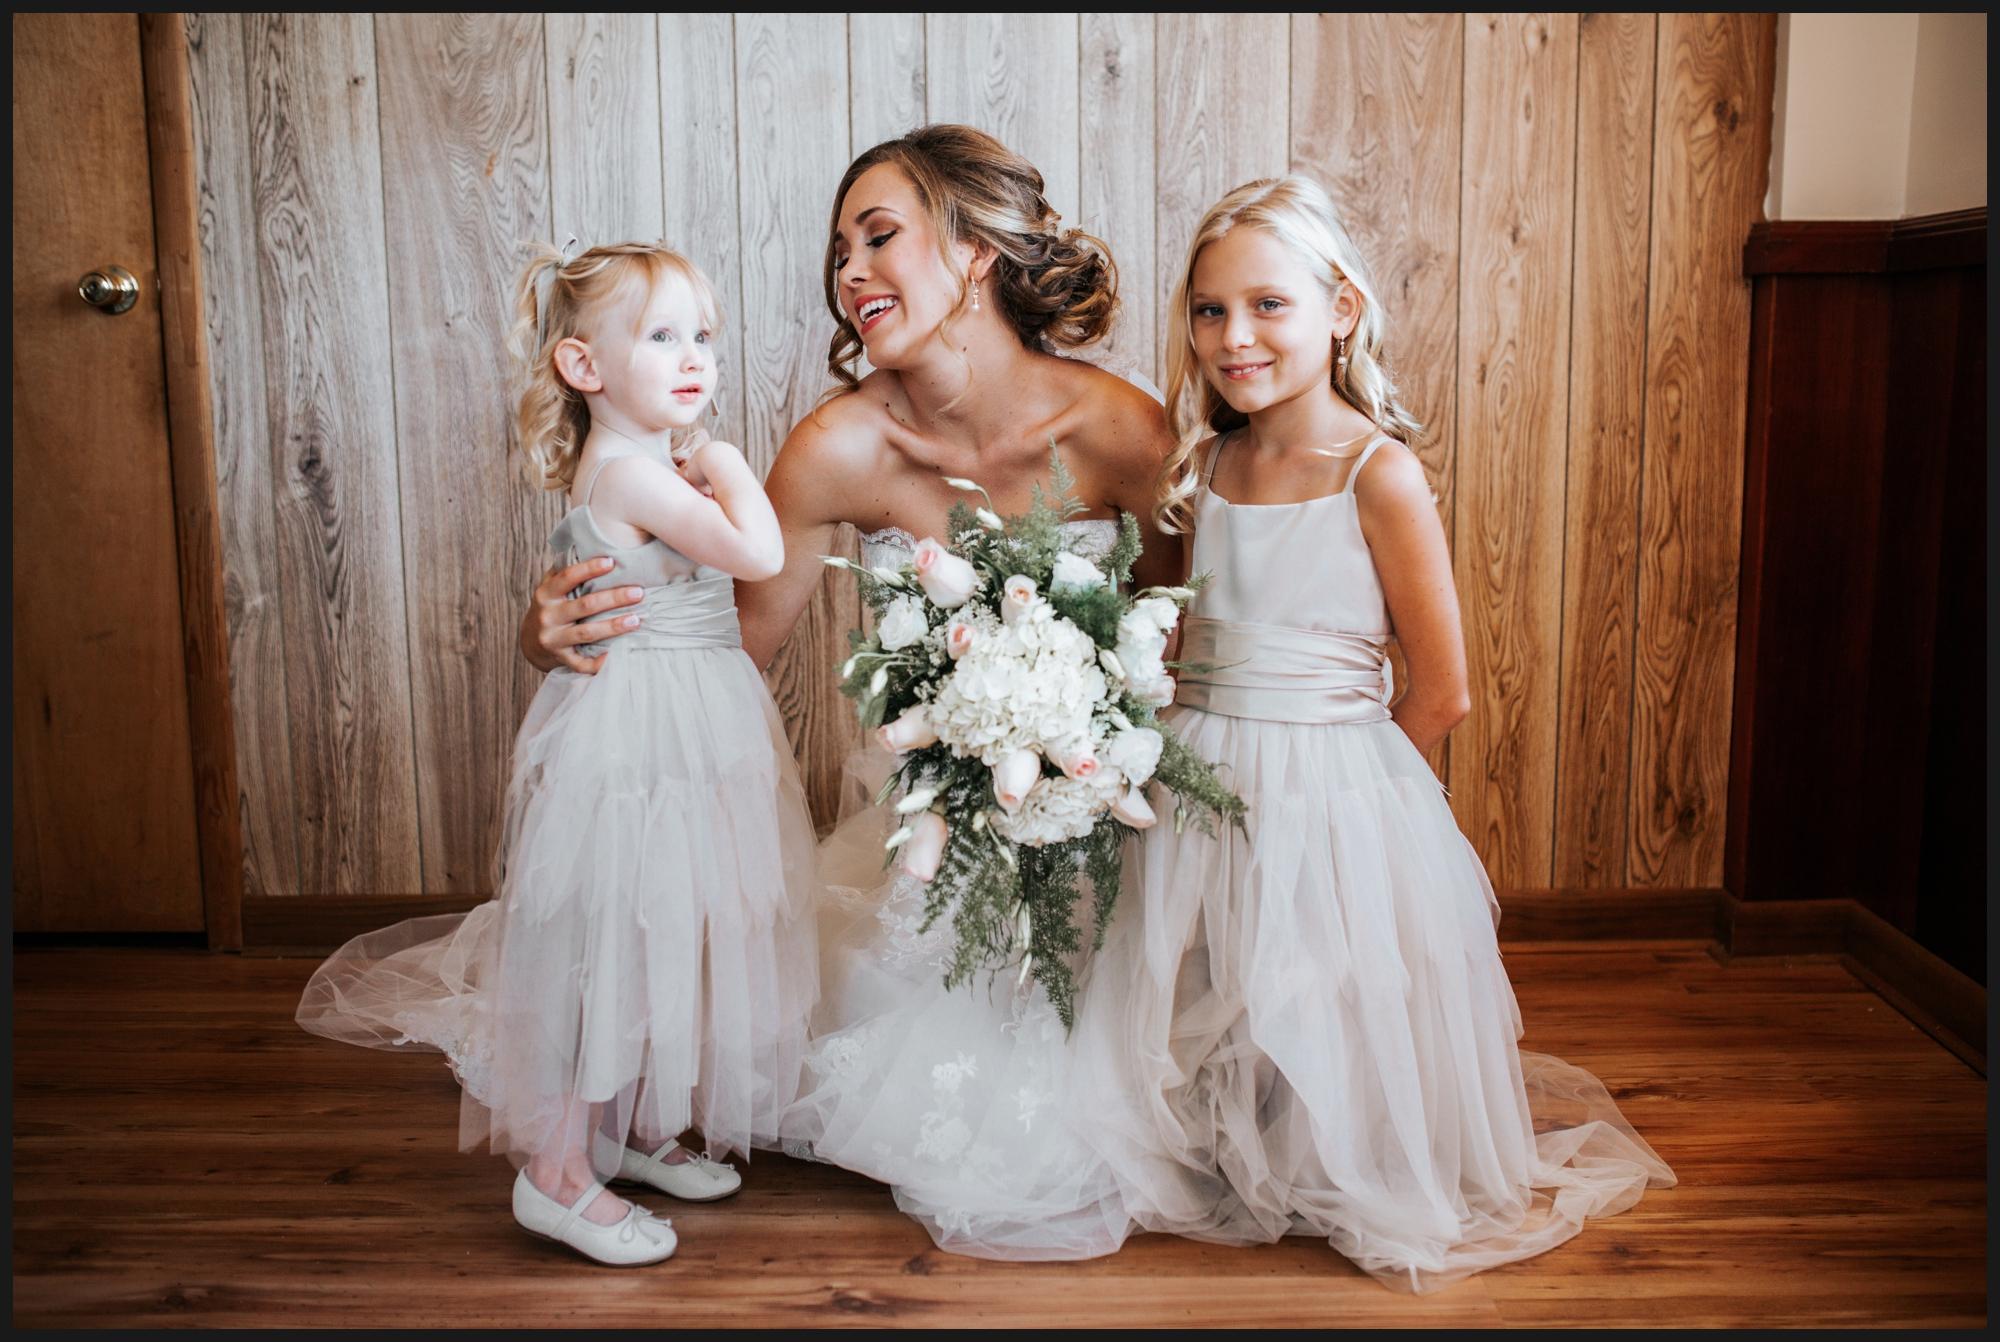 Orlando-Wedding-Photographer-destination-wedding-photographer-florida-wedding-photographer-bohemian-wedding-photographer_0063.jpg